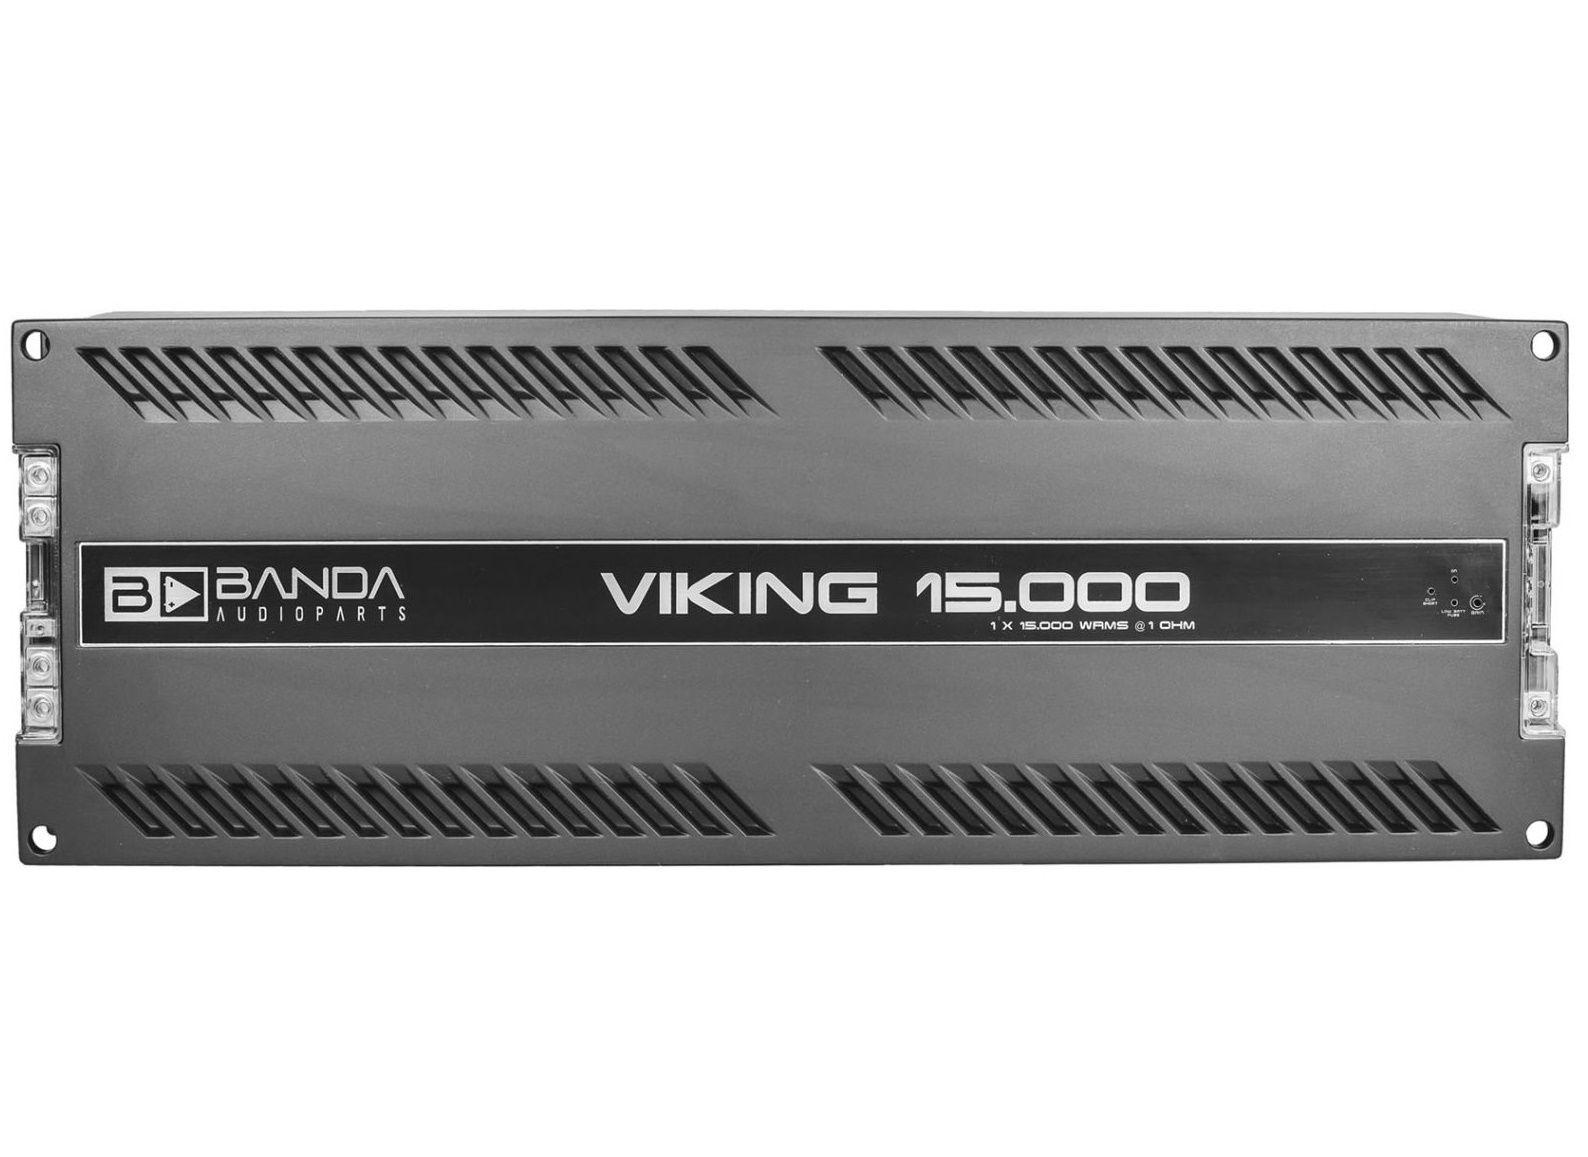 Módulo Amplificador Banda Viking 15000 15000W Rms 1 Ohms 1 Canal